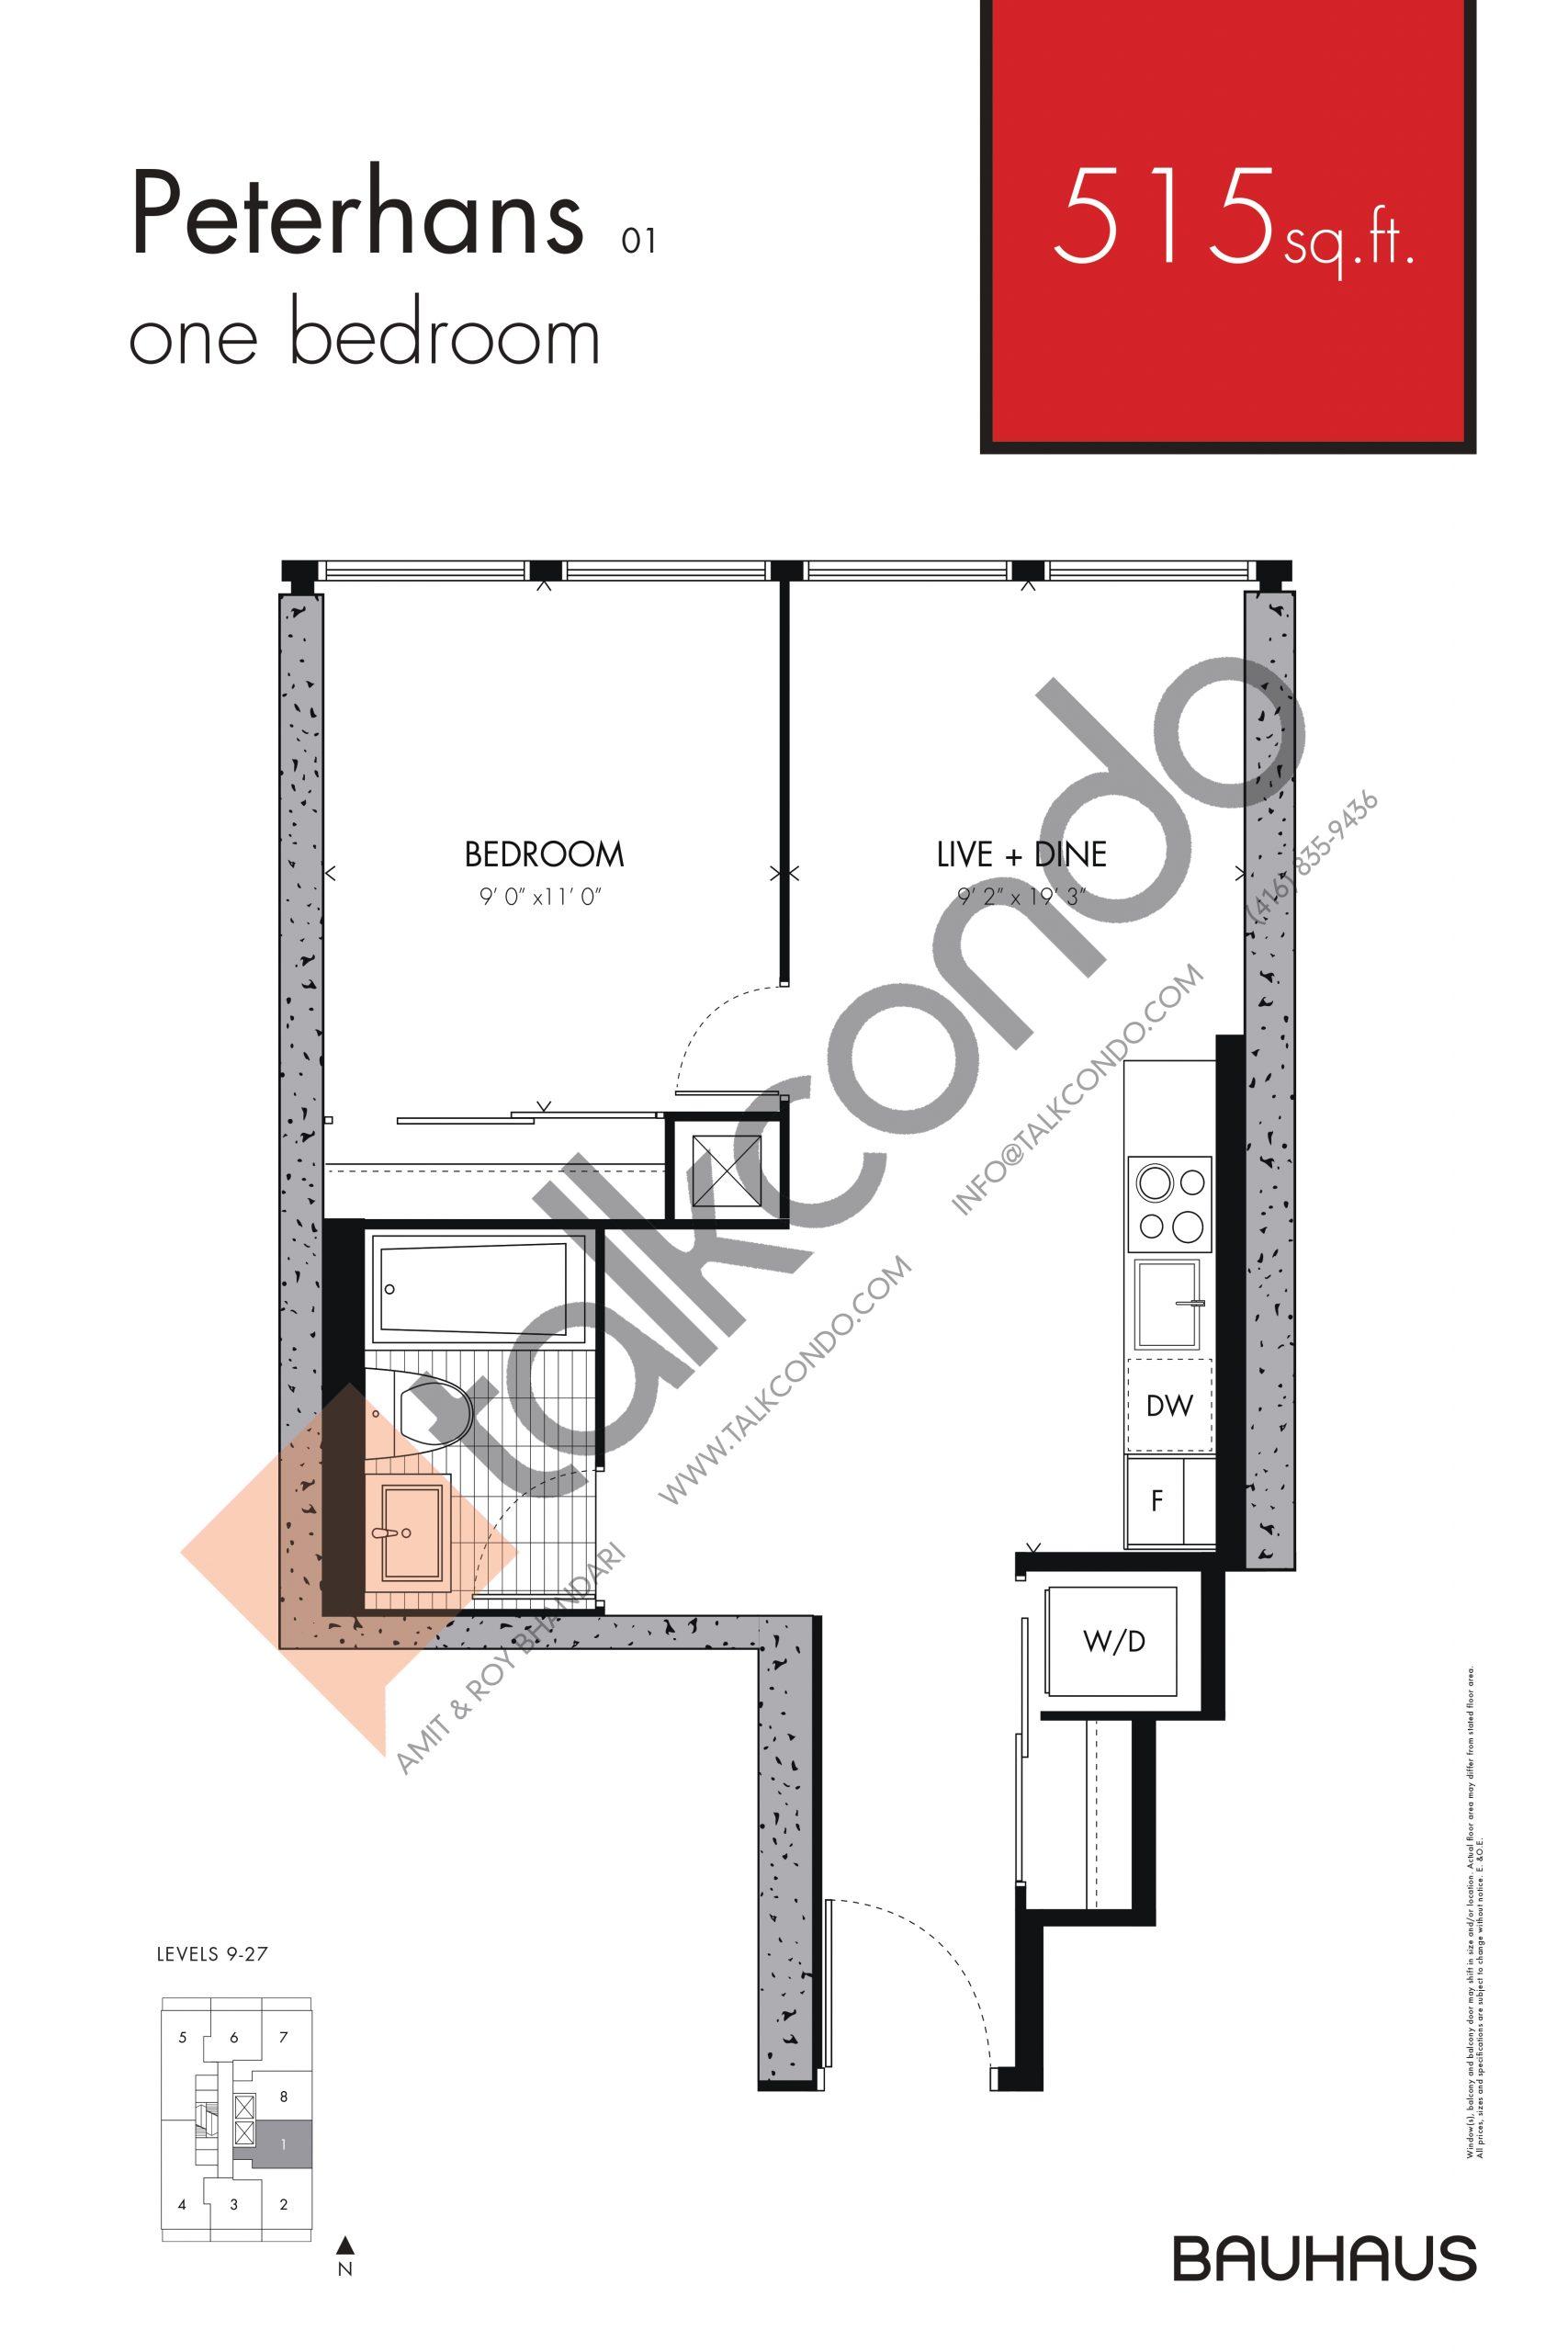 Peterhans Floor Plan at Bauhaus Condos - 515 sq.ft